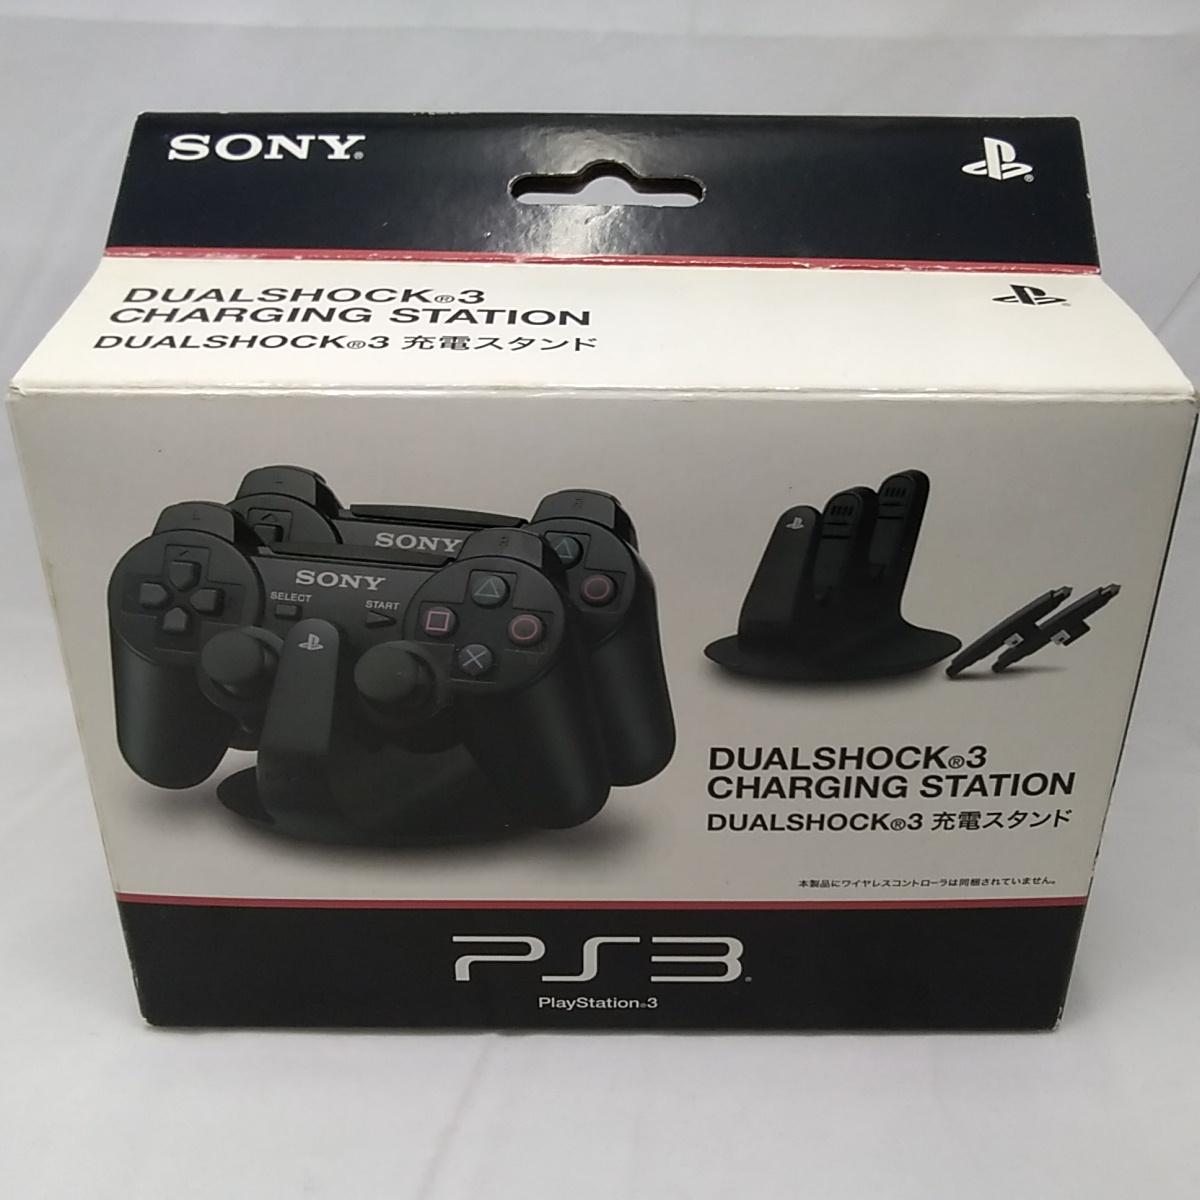 PS3アクセサリ|SONY